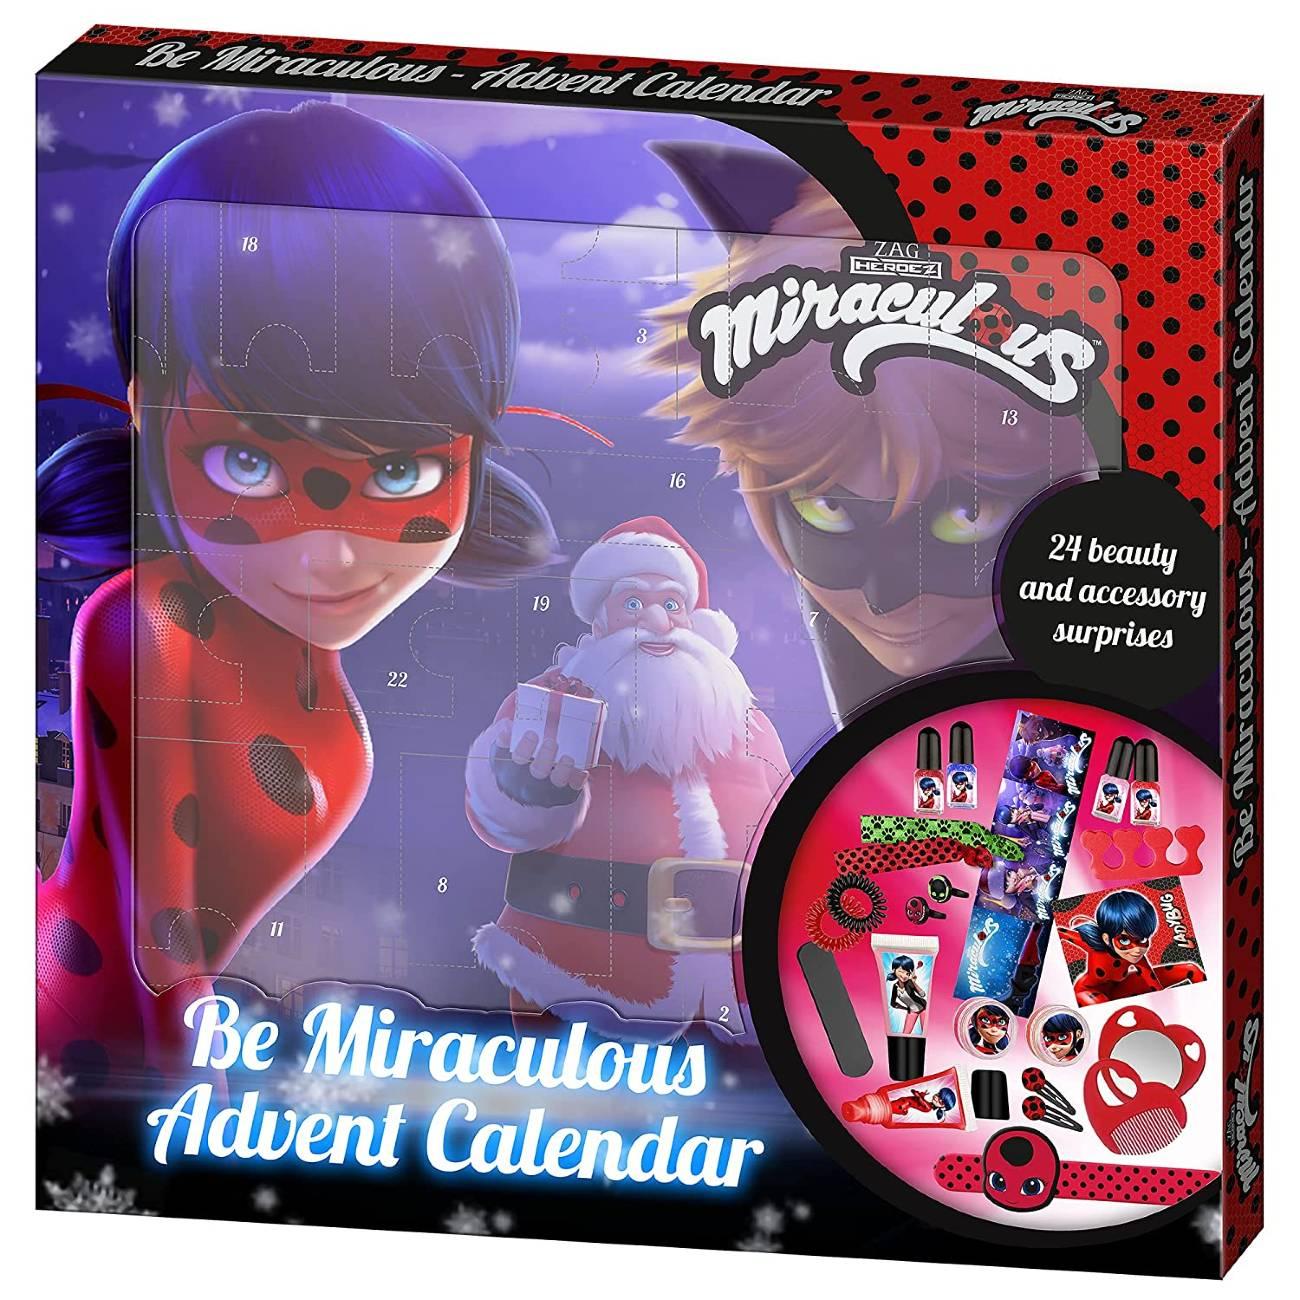 Ladybug Calendario Adviento 2021 Be Miraculous